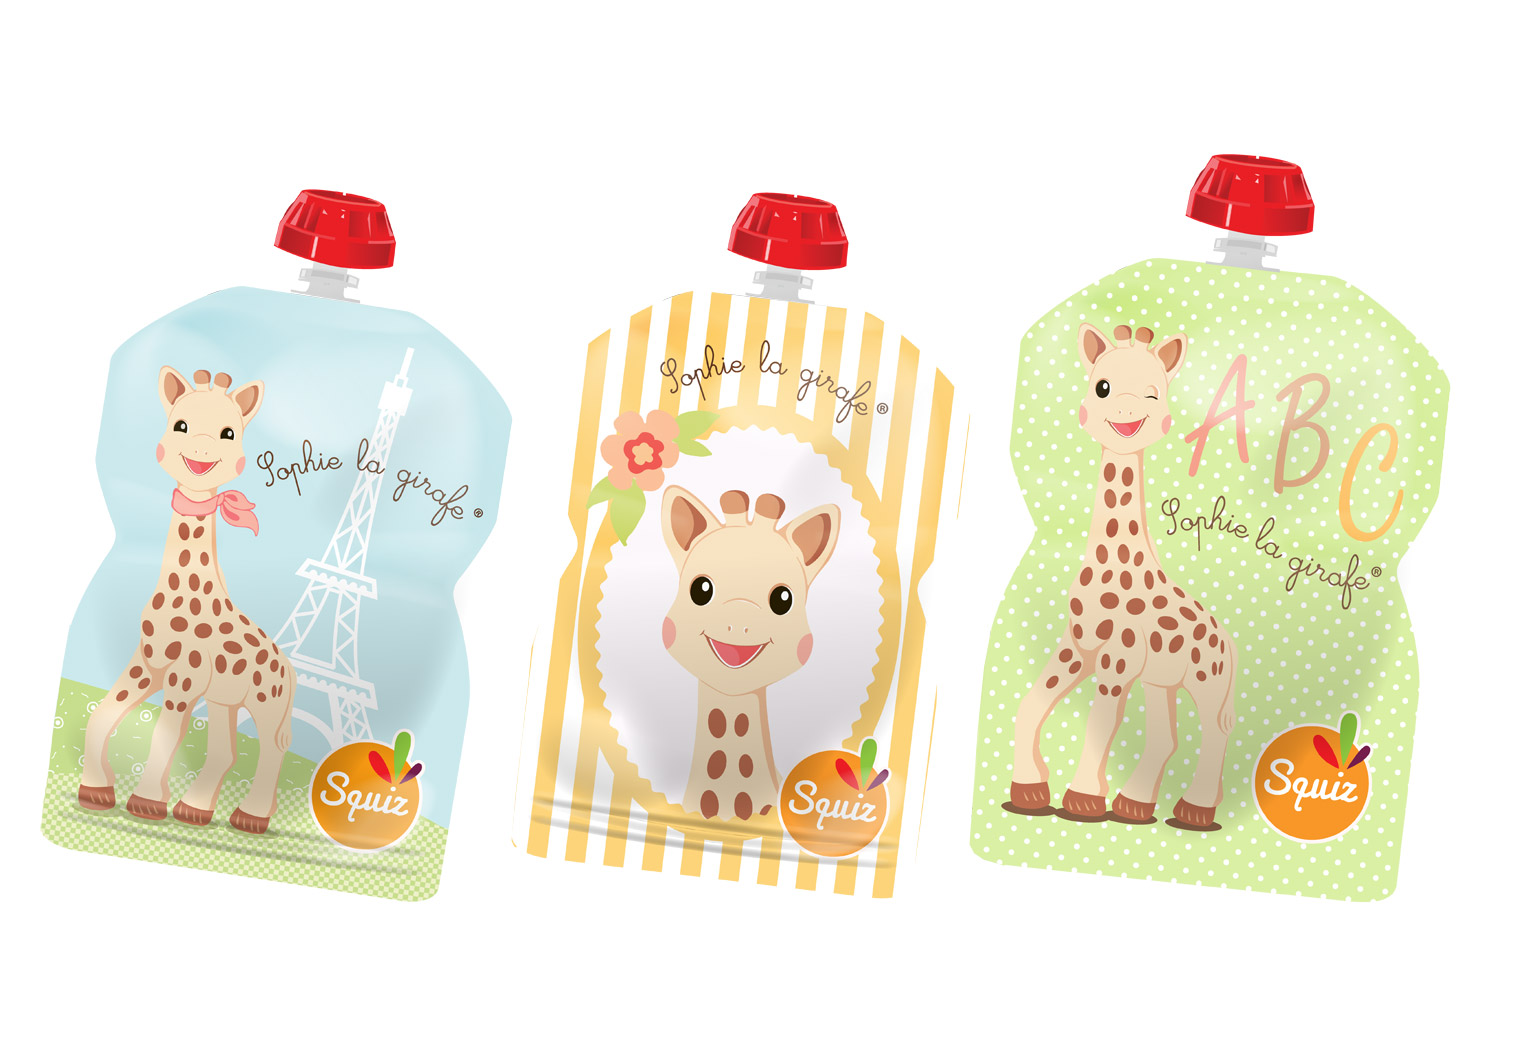 squiz-sophie-girafe-1